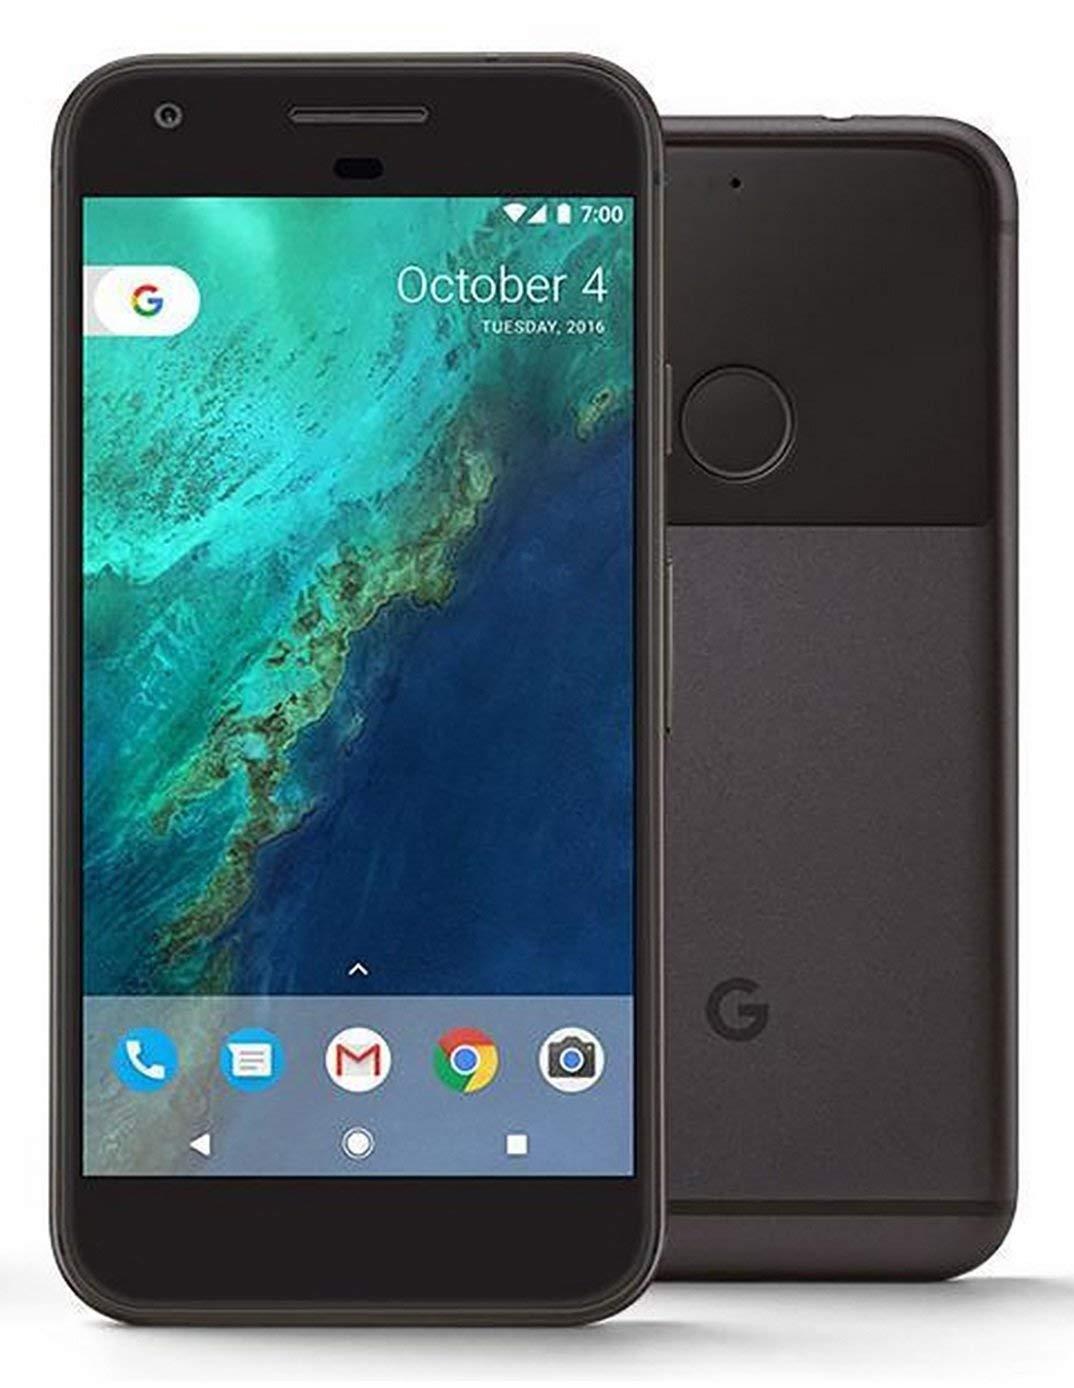 Google Pixel XL 128GB Unlocked GSM Phone w/ 12 3MP Camera - Quite Black